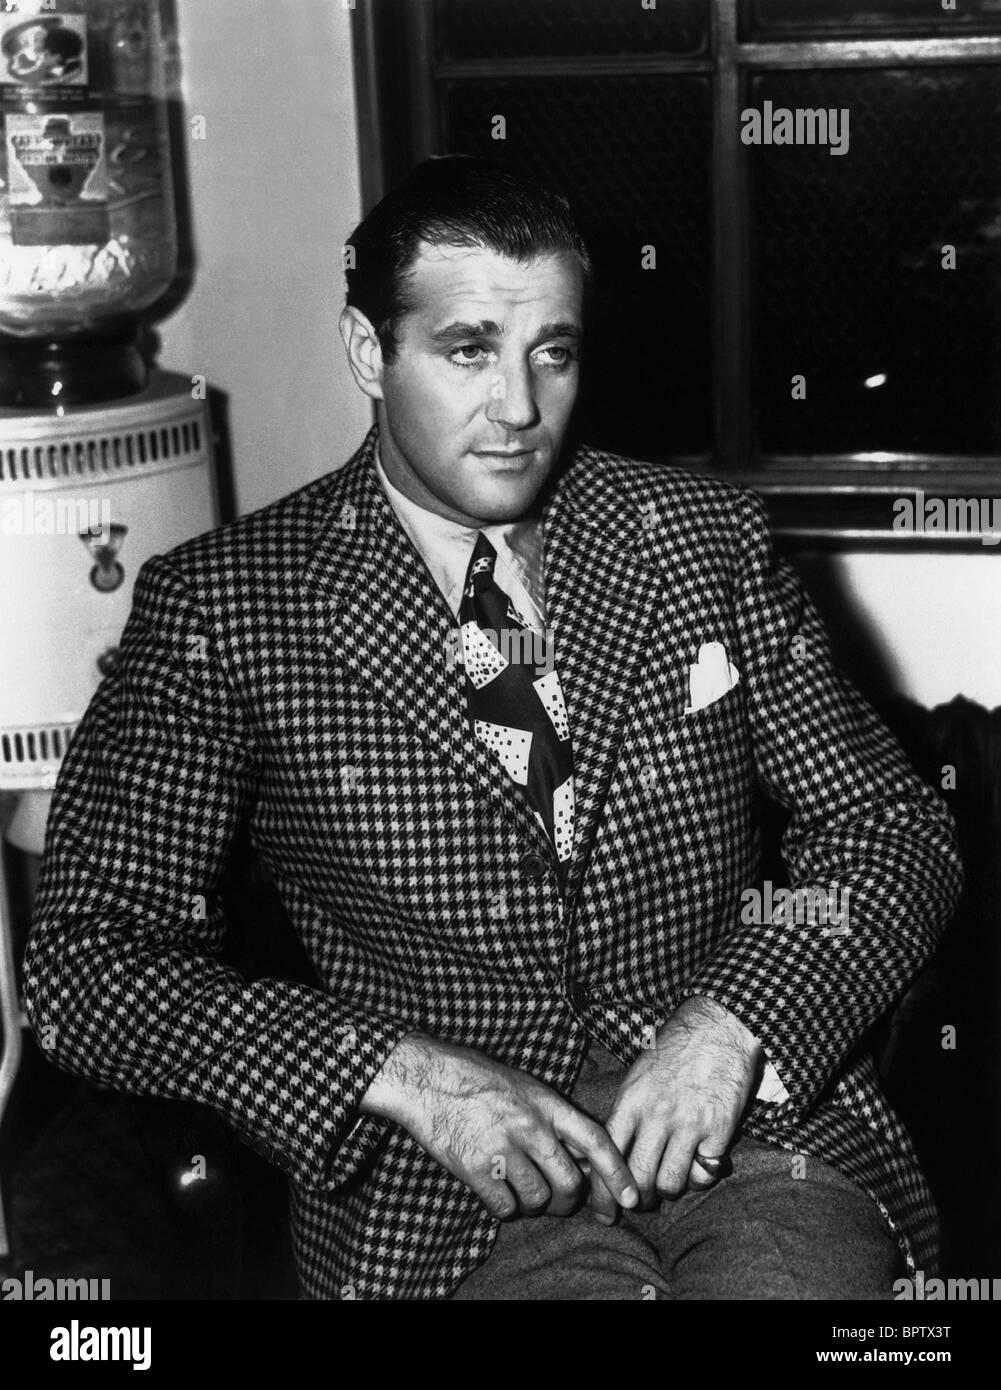 benjamin bugsy siegel gangster 1940 stock photo 31280140 alamy